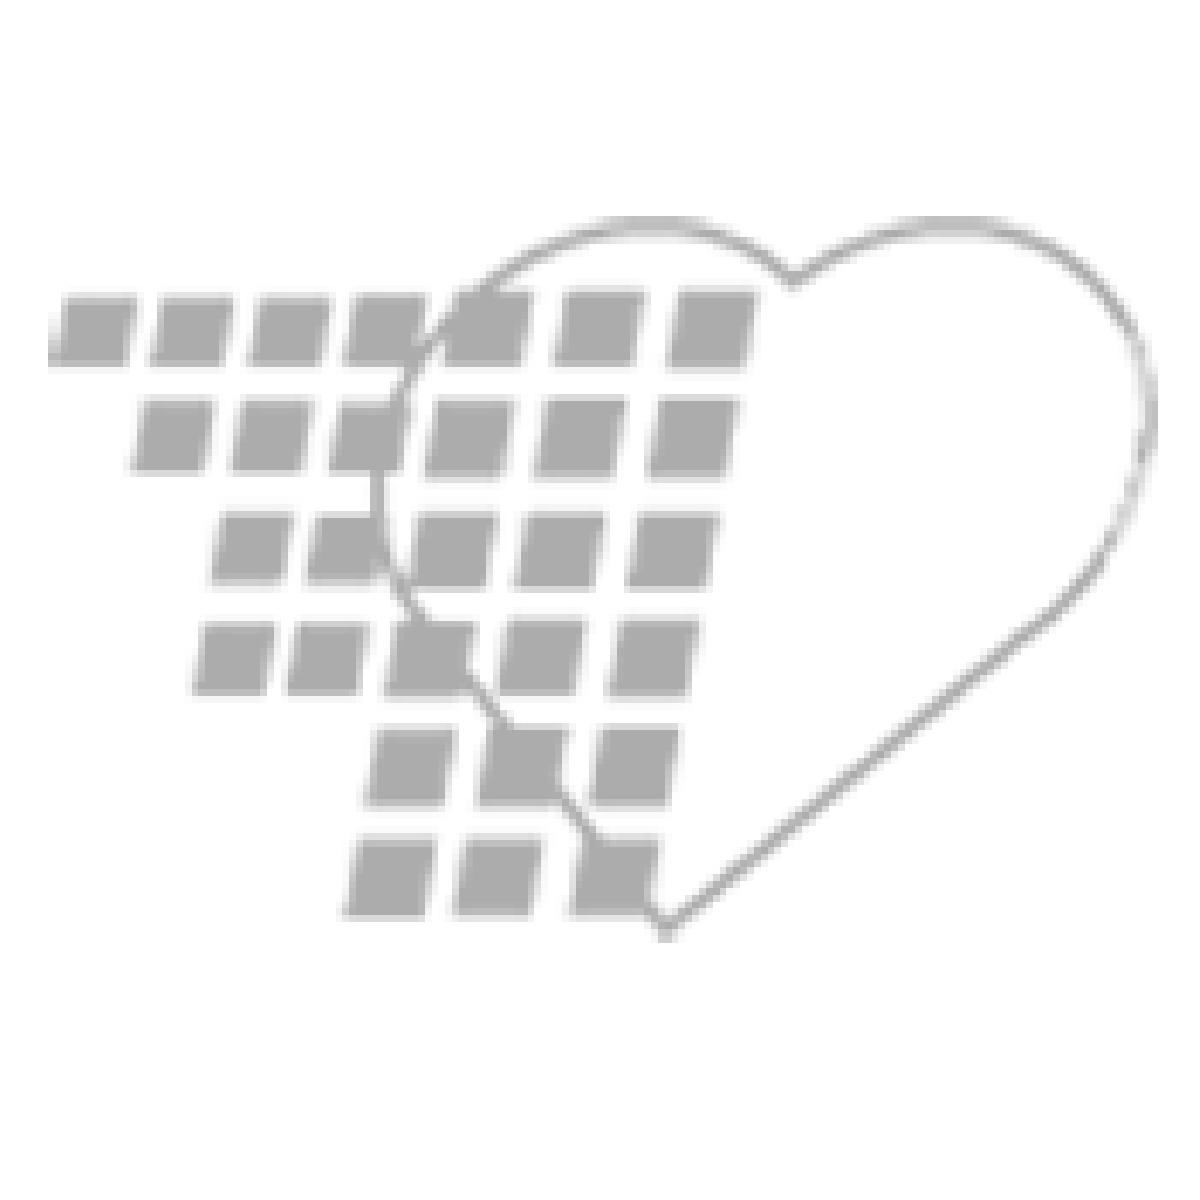 06-93-1131 - Demo Dose® Lidocain 2% 5mL